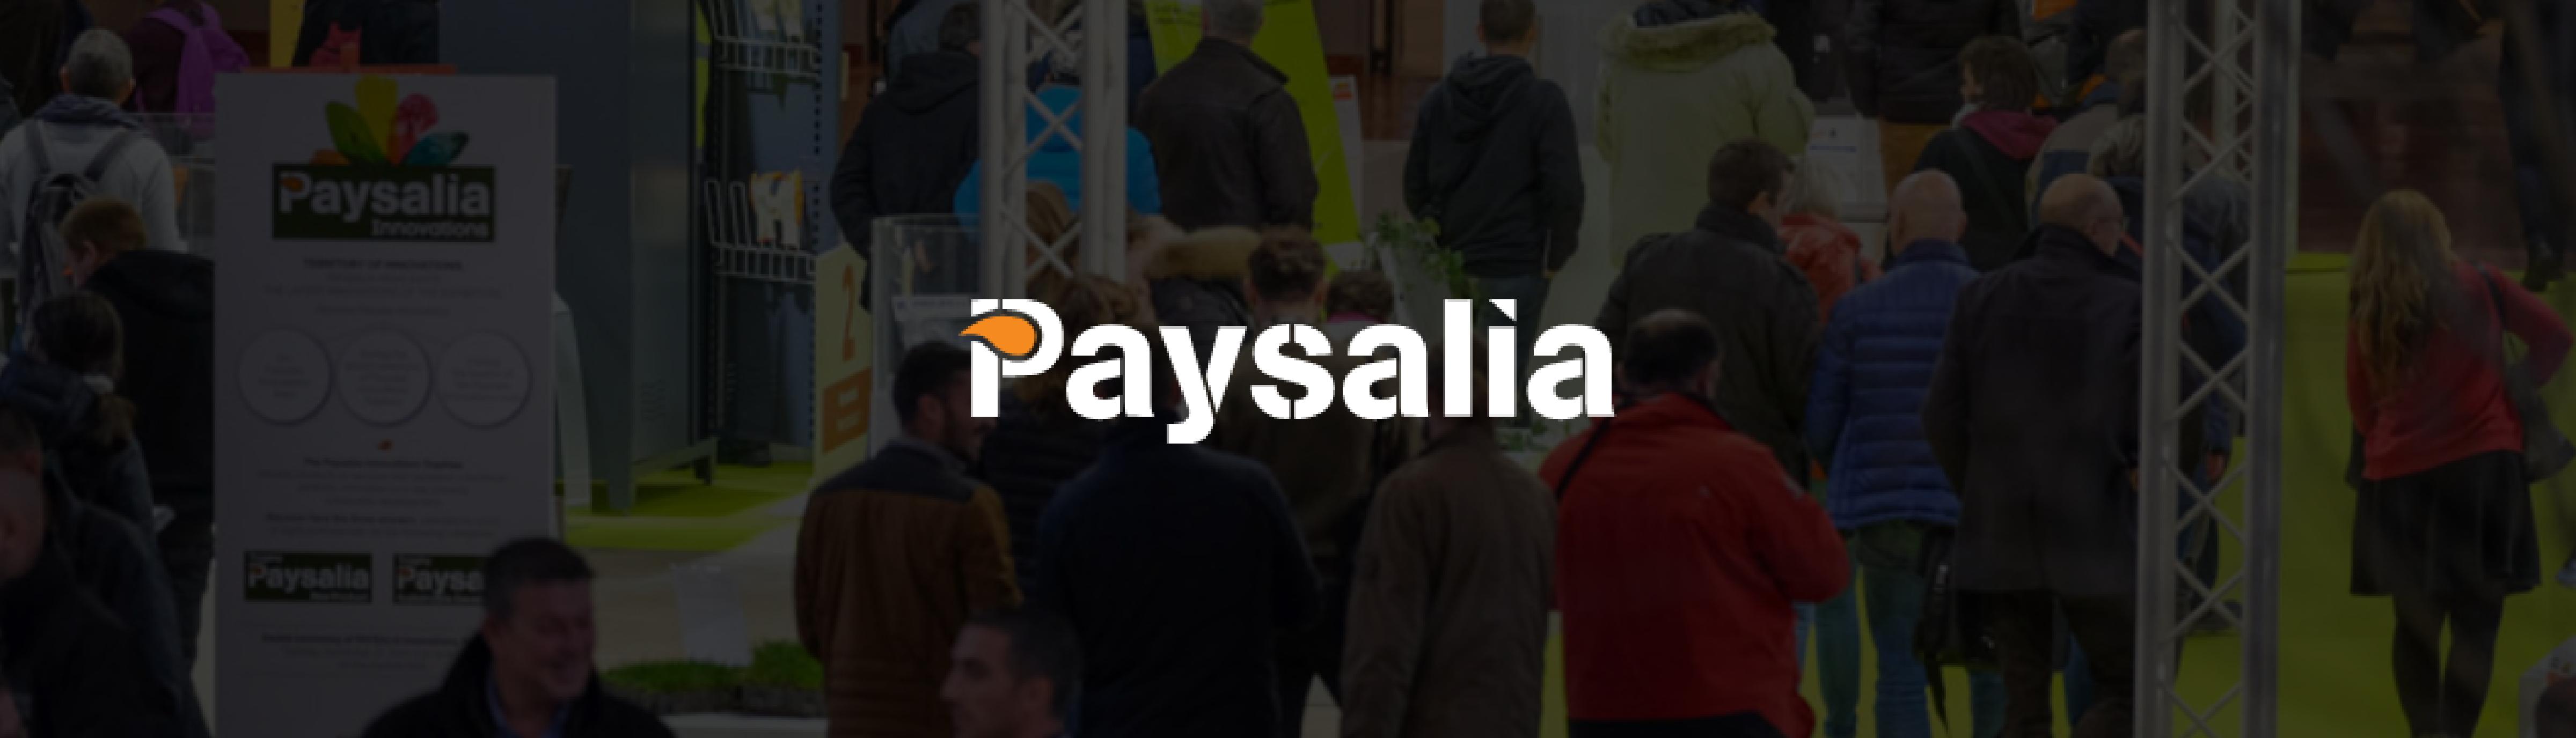 paysalia_landing_top_position_white4x.png